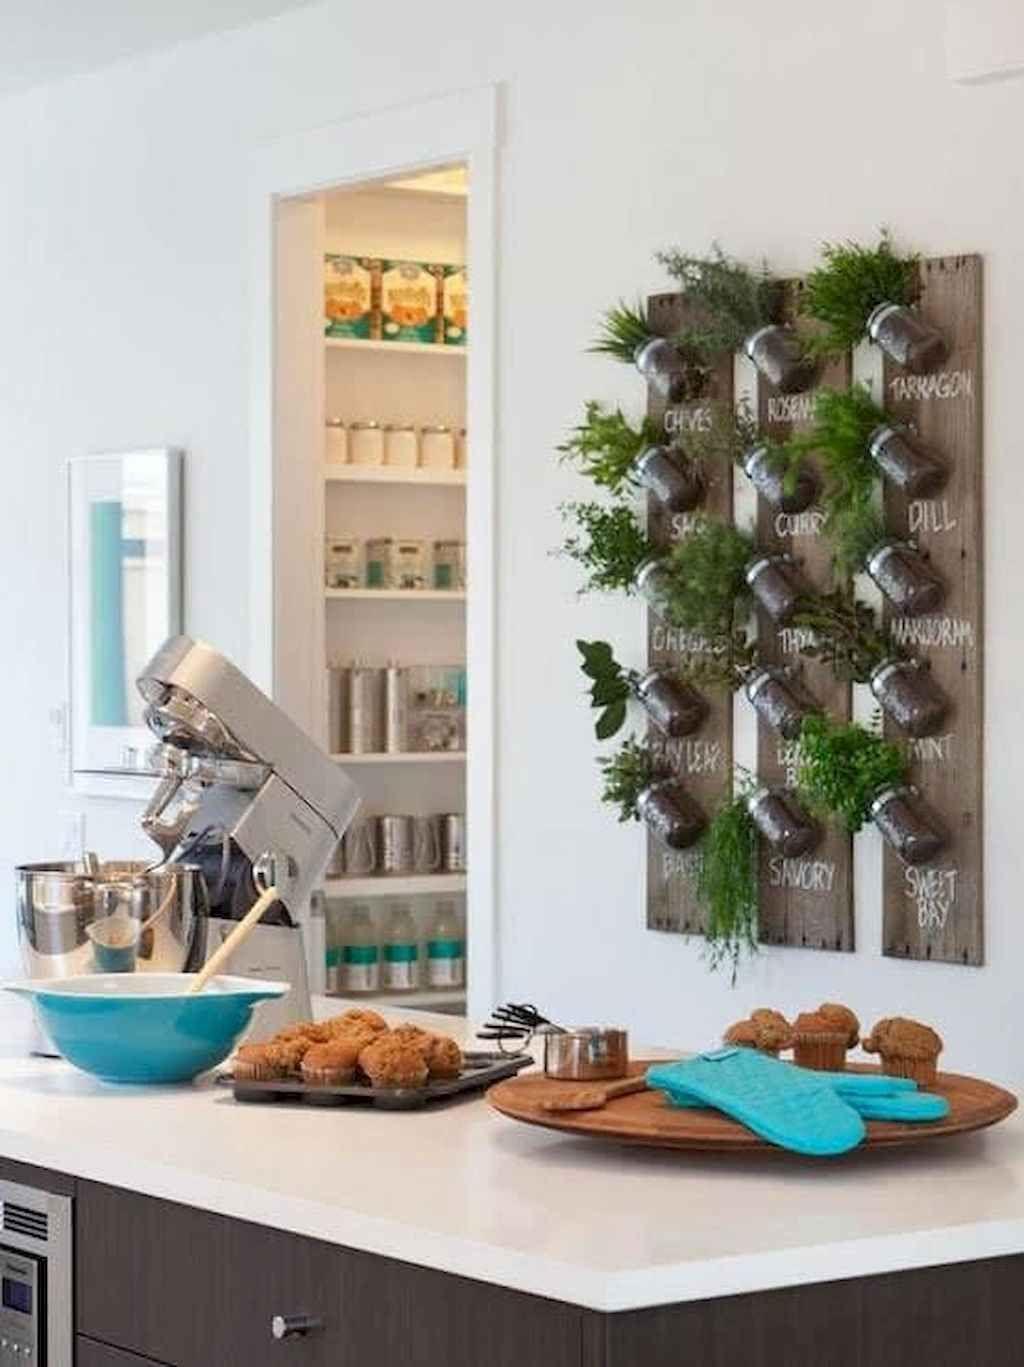 80 brilliant apartment garden indoor decor ideas 55 on indoor herb garden diy wall kitchens id=71658